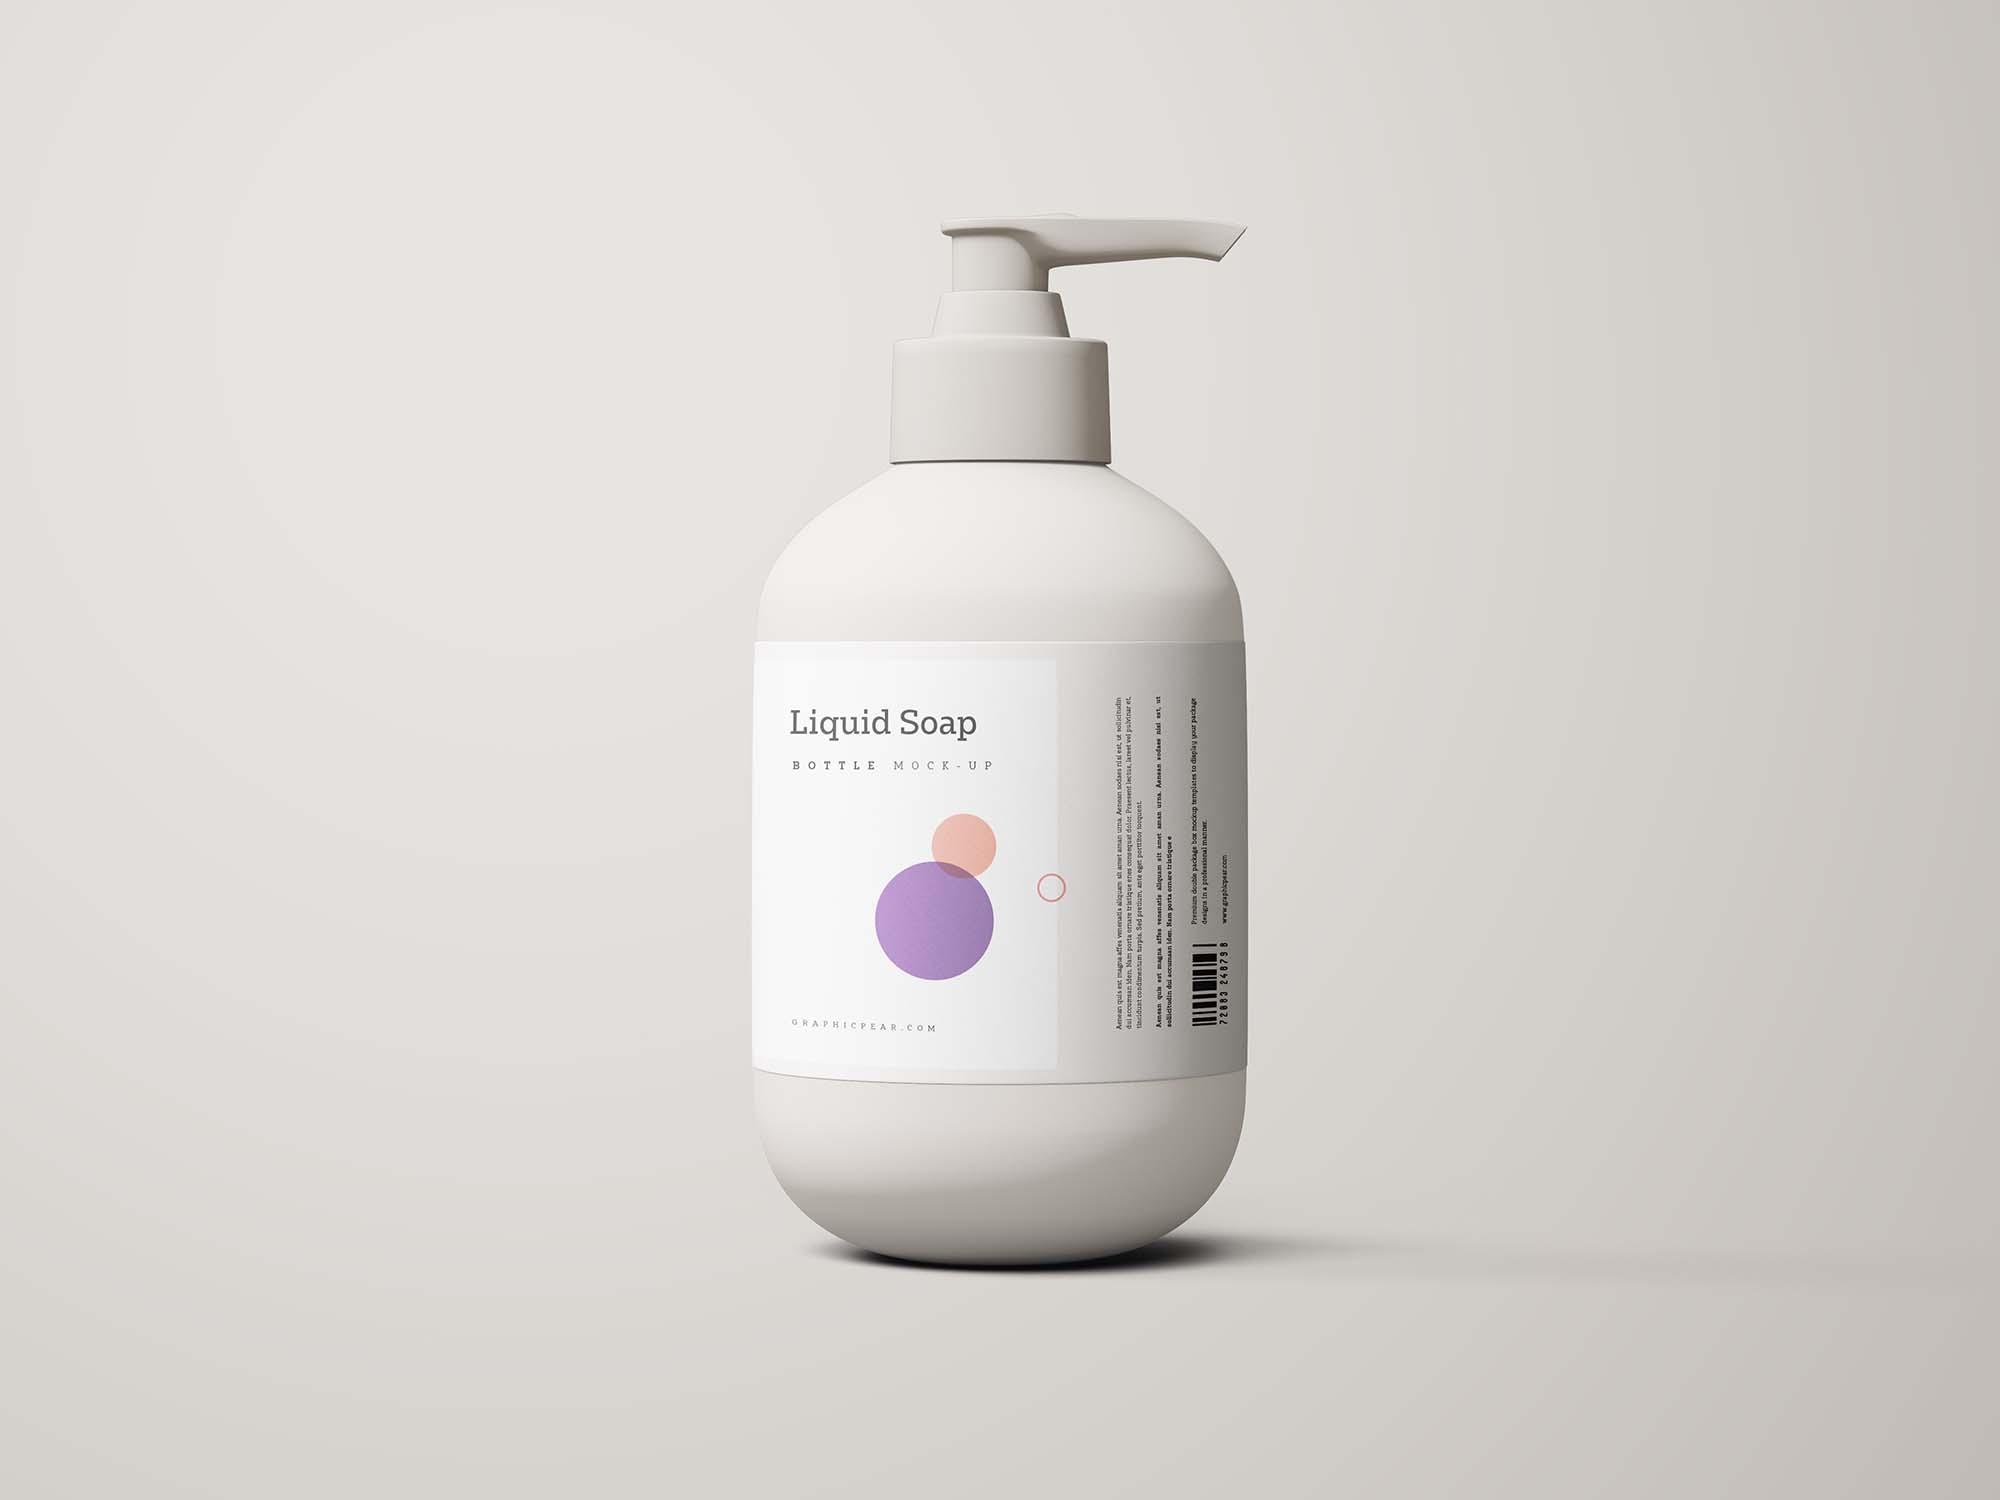 Free Hand Sanitizer Bottle Mockup